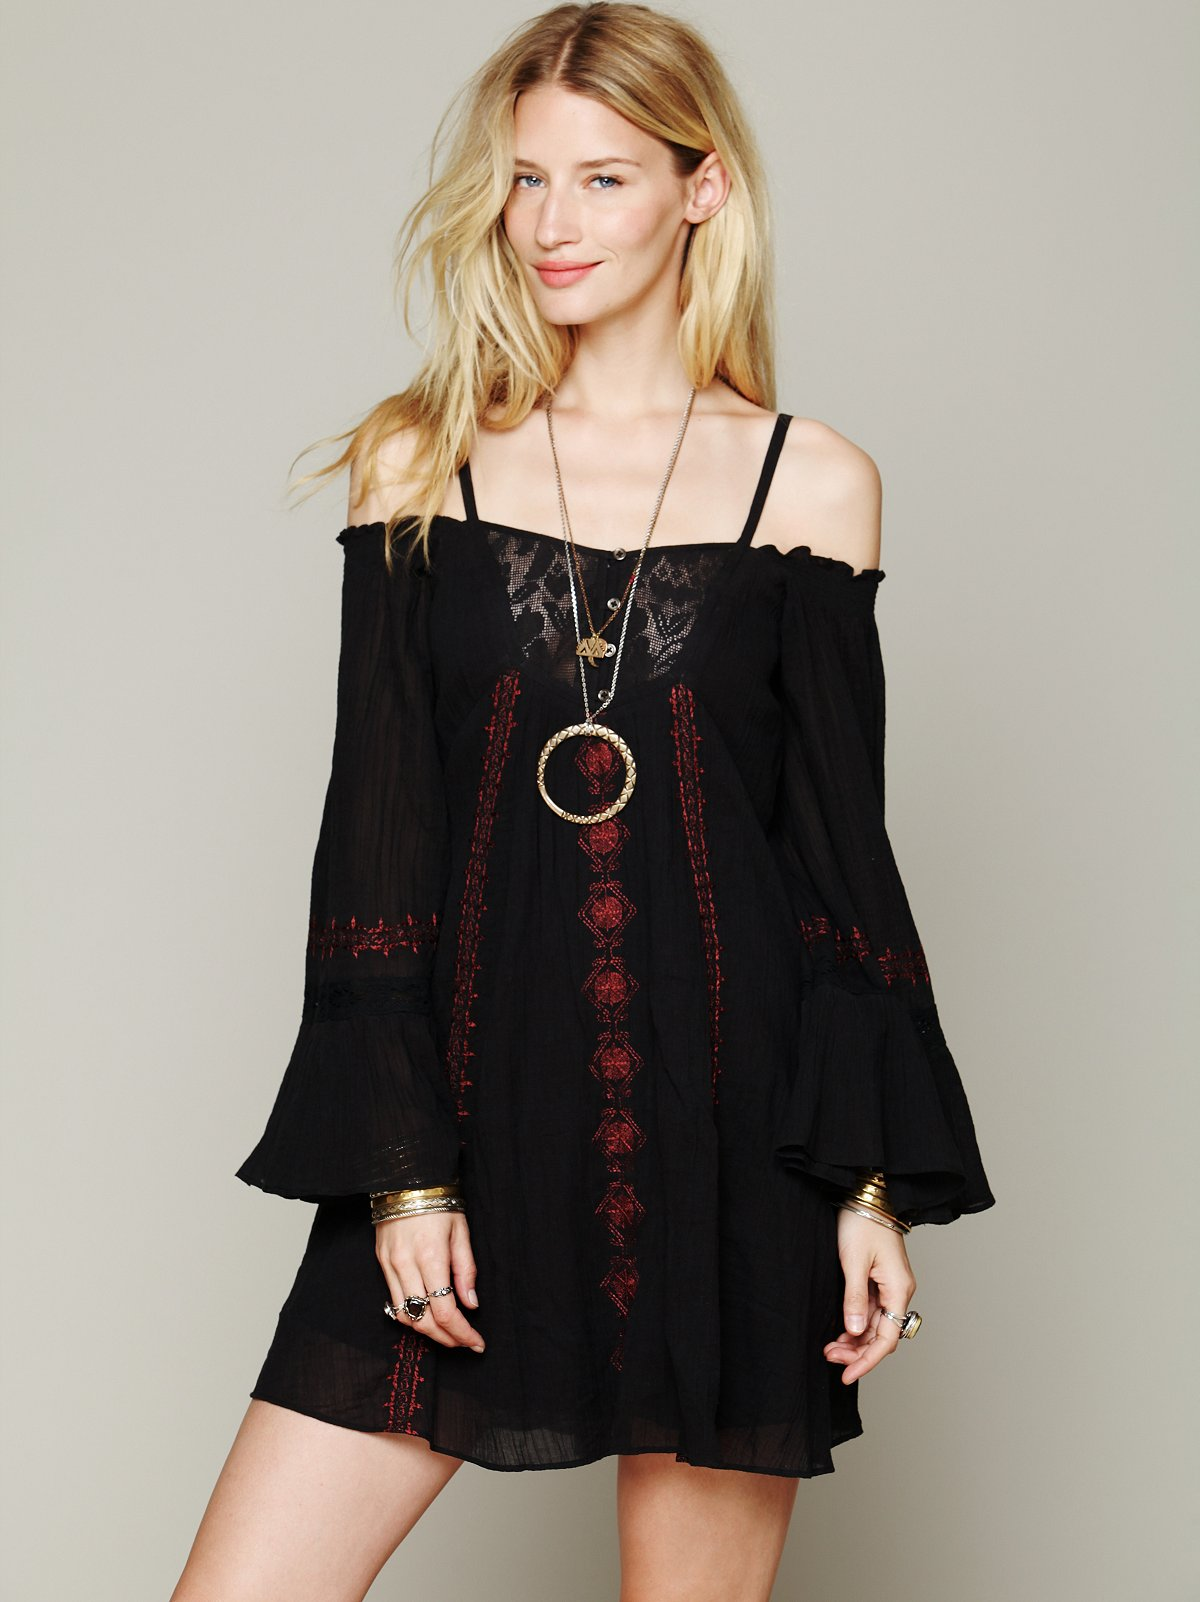 Moonlight Kingdom Dress